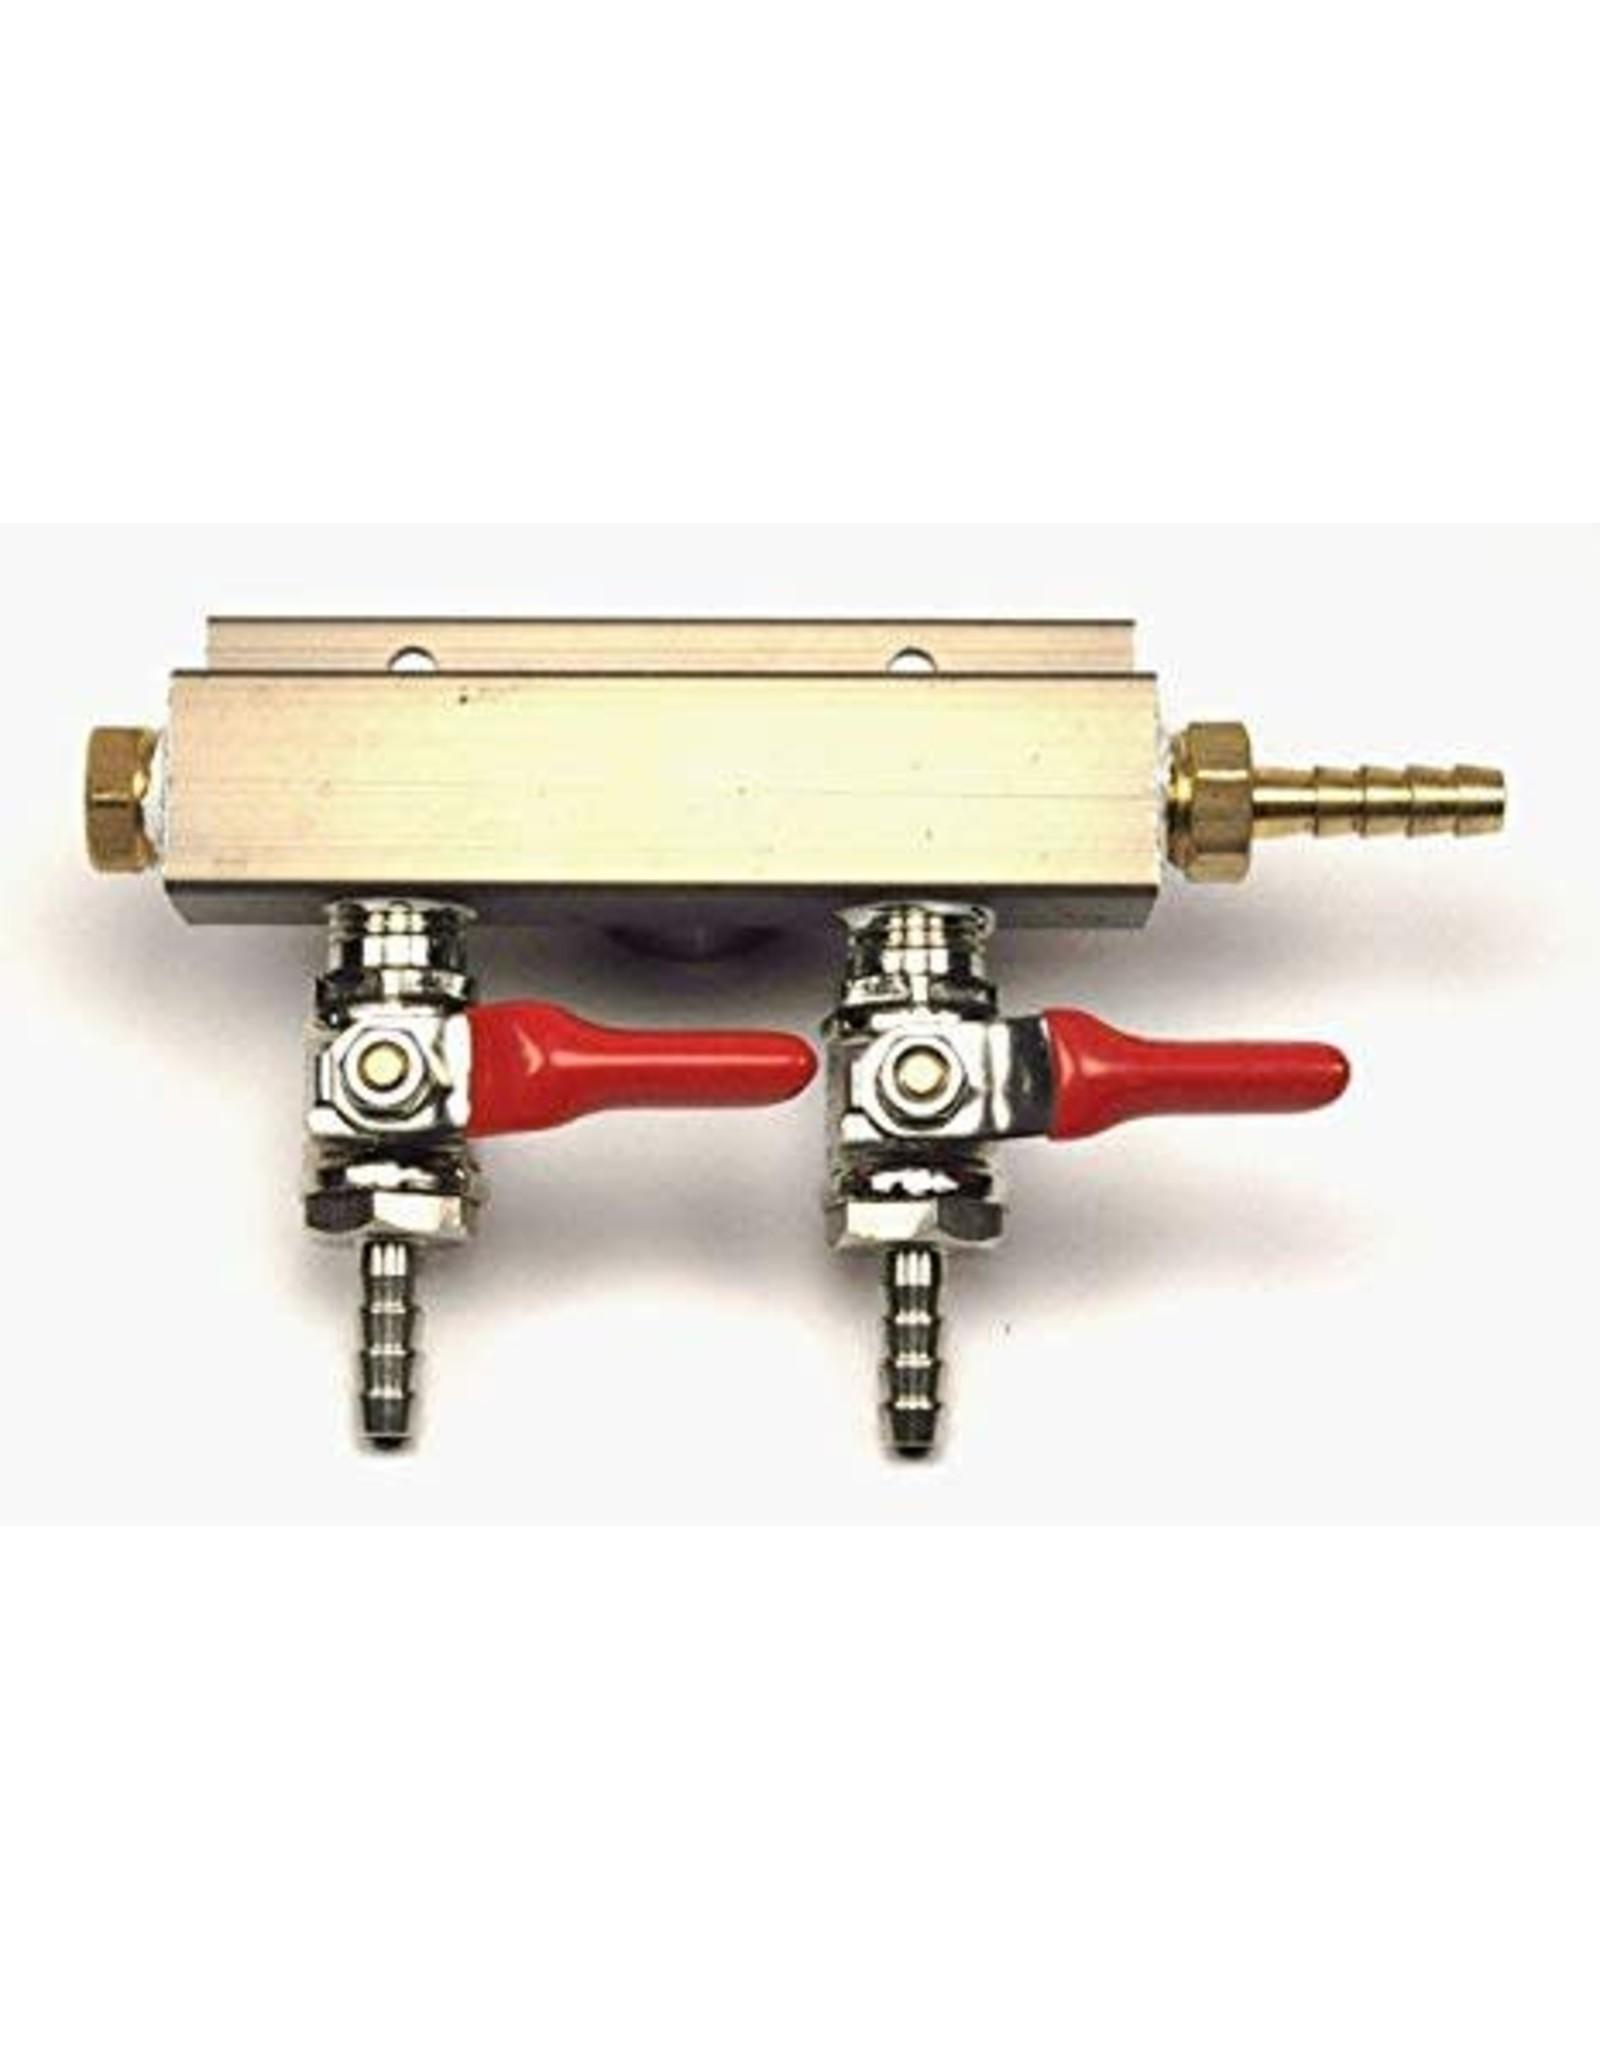 2-Way Air Manifold Distributor